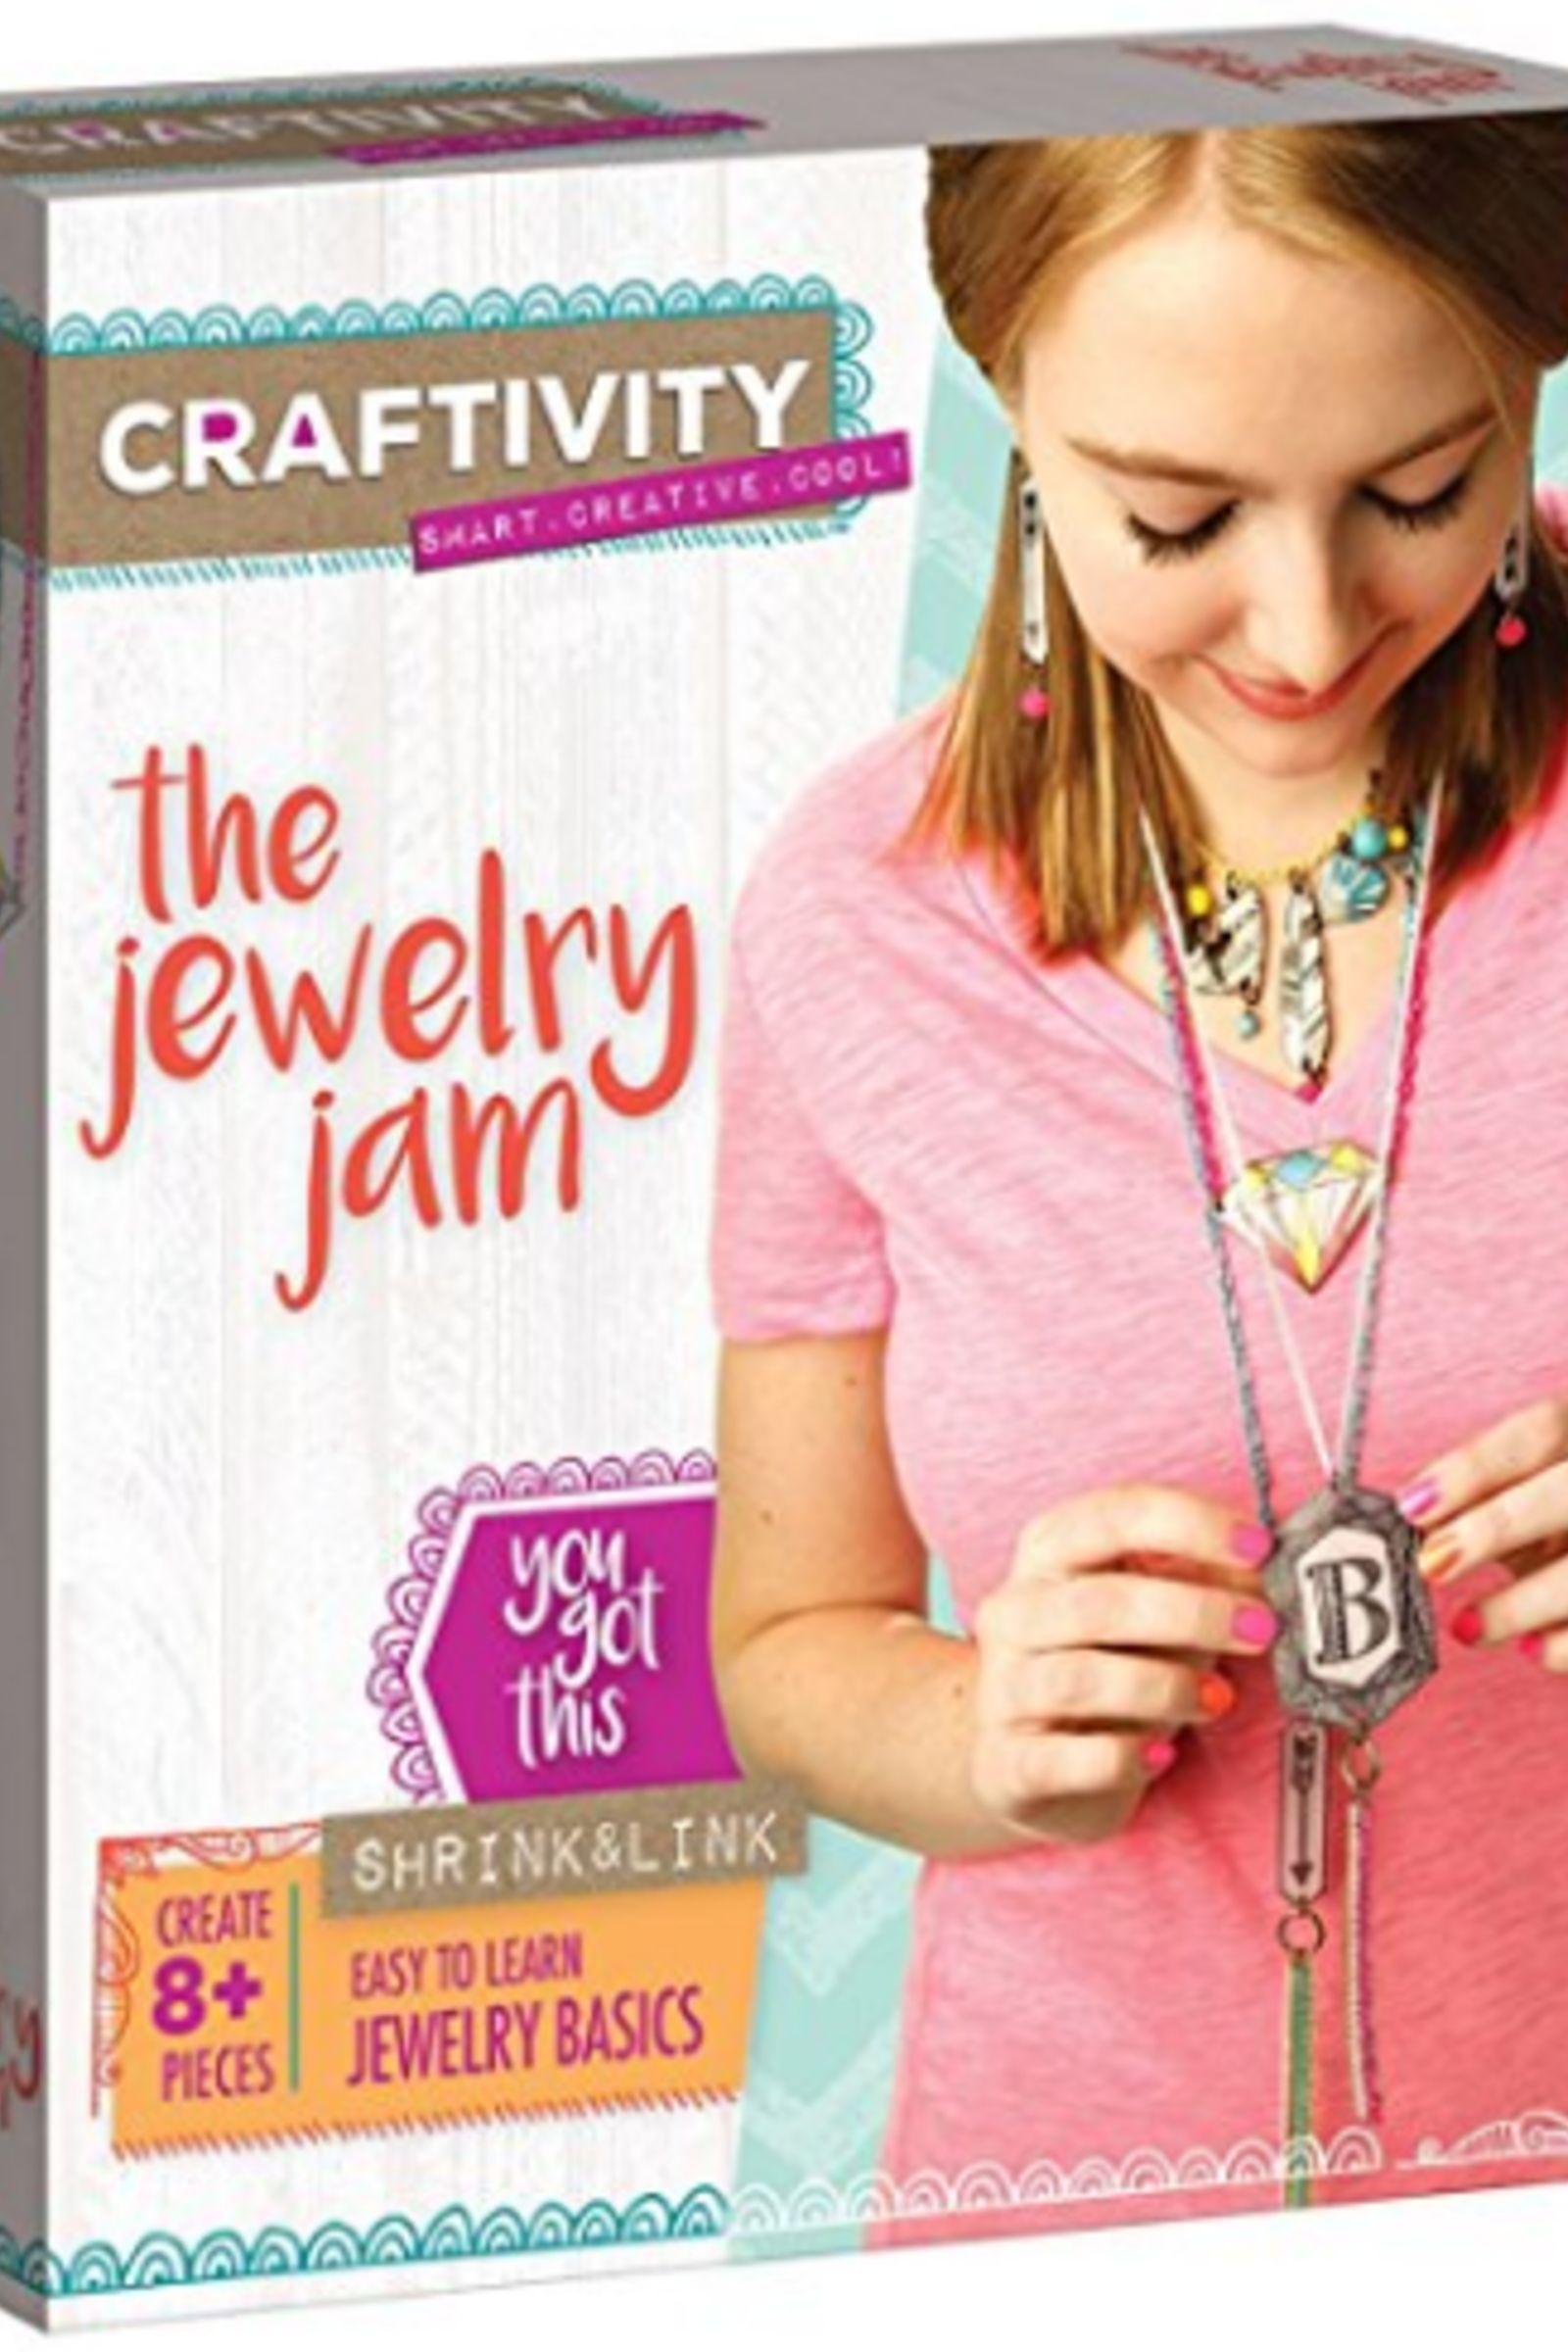 Craftivity Jewelry Project Kit Gift Ideas Under 25 Tween Girls